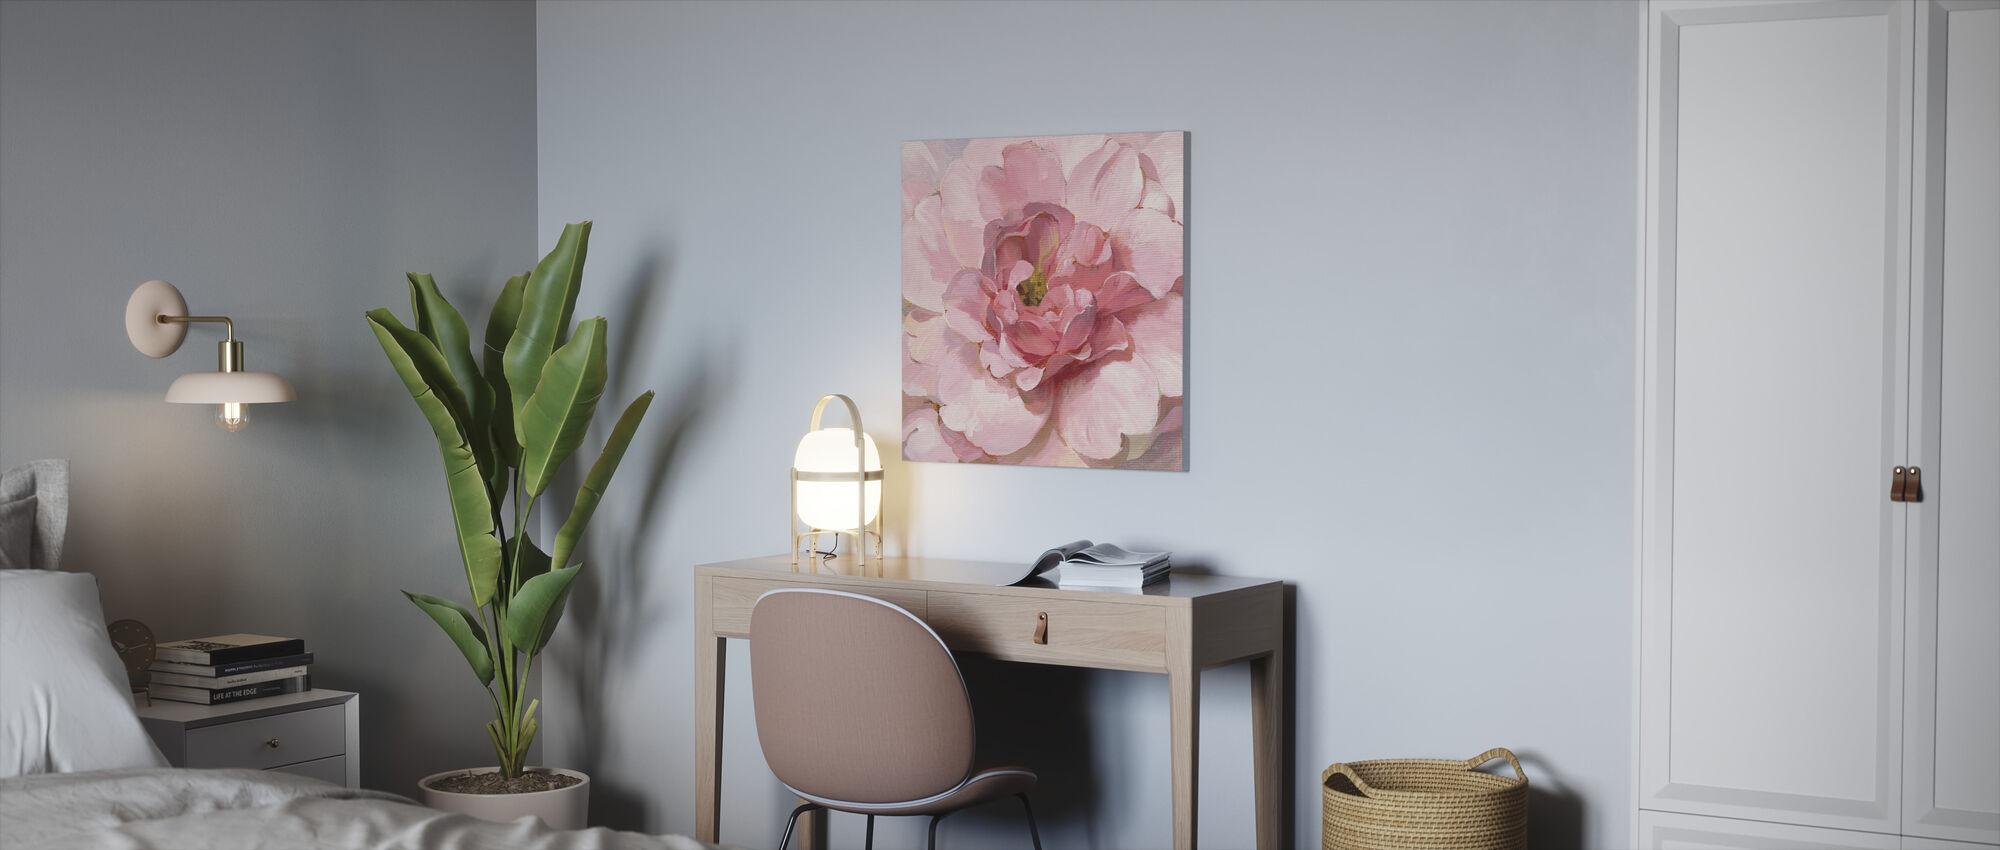 Blushing Peony - Canvas print - Office